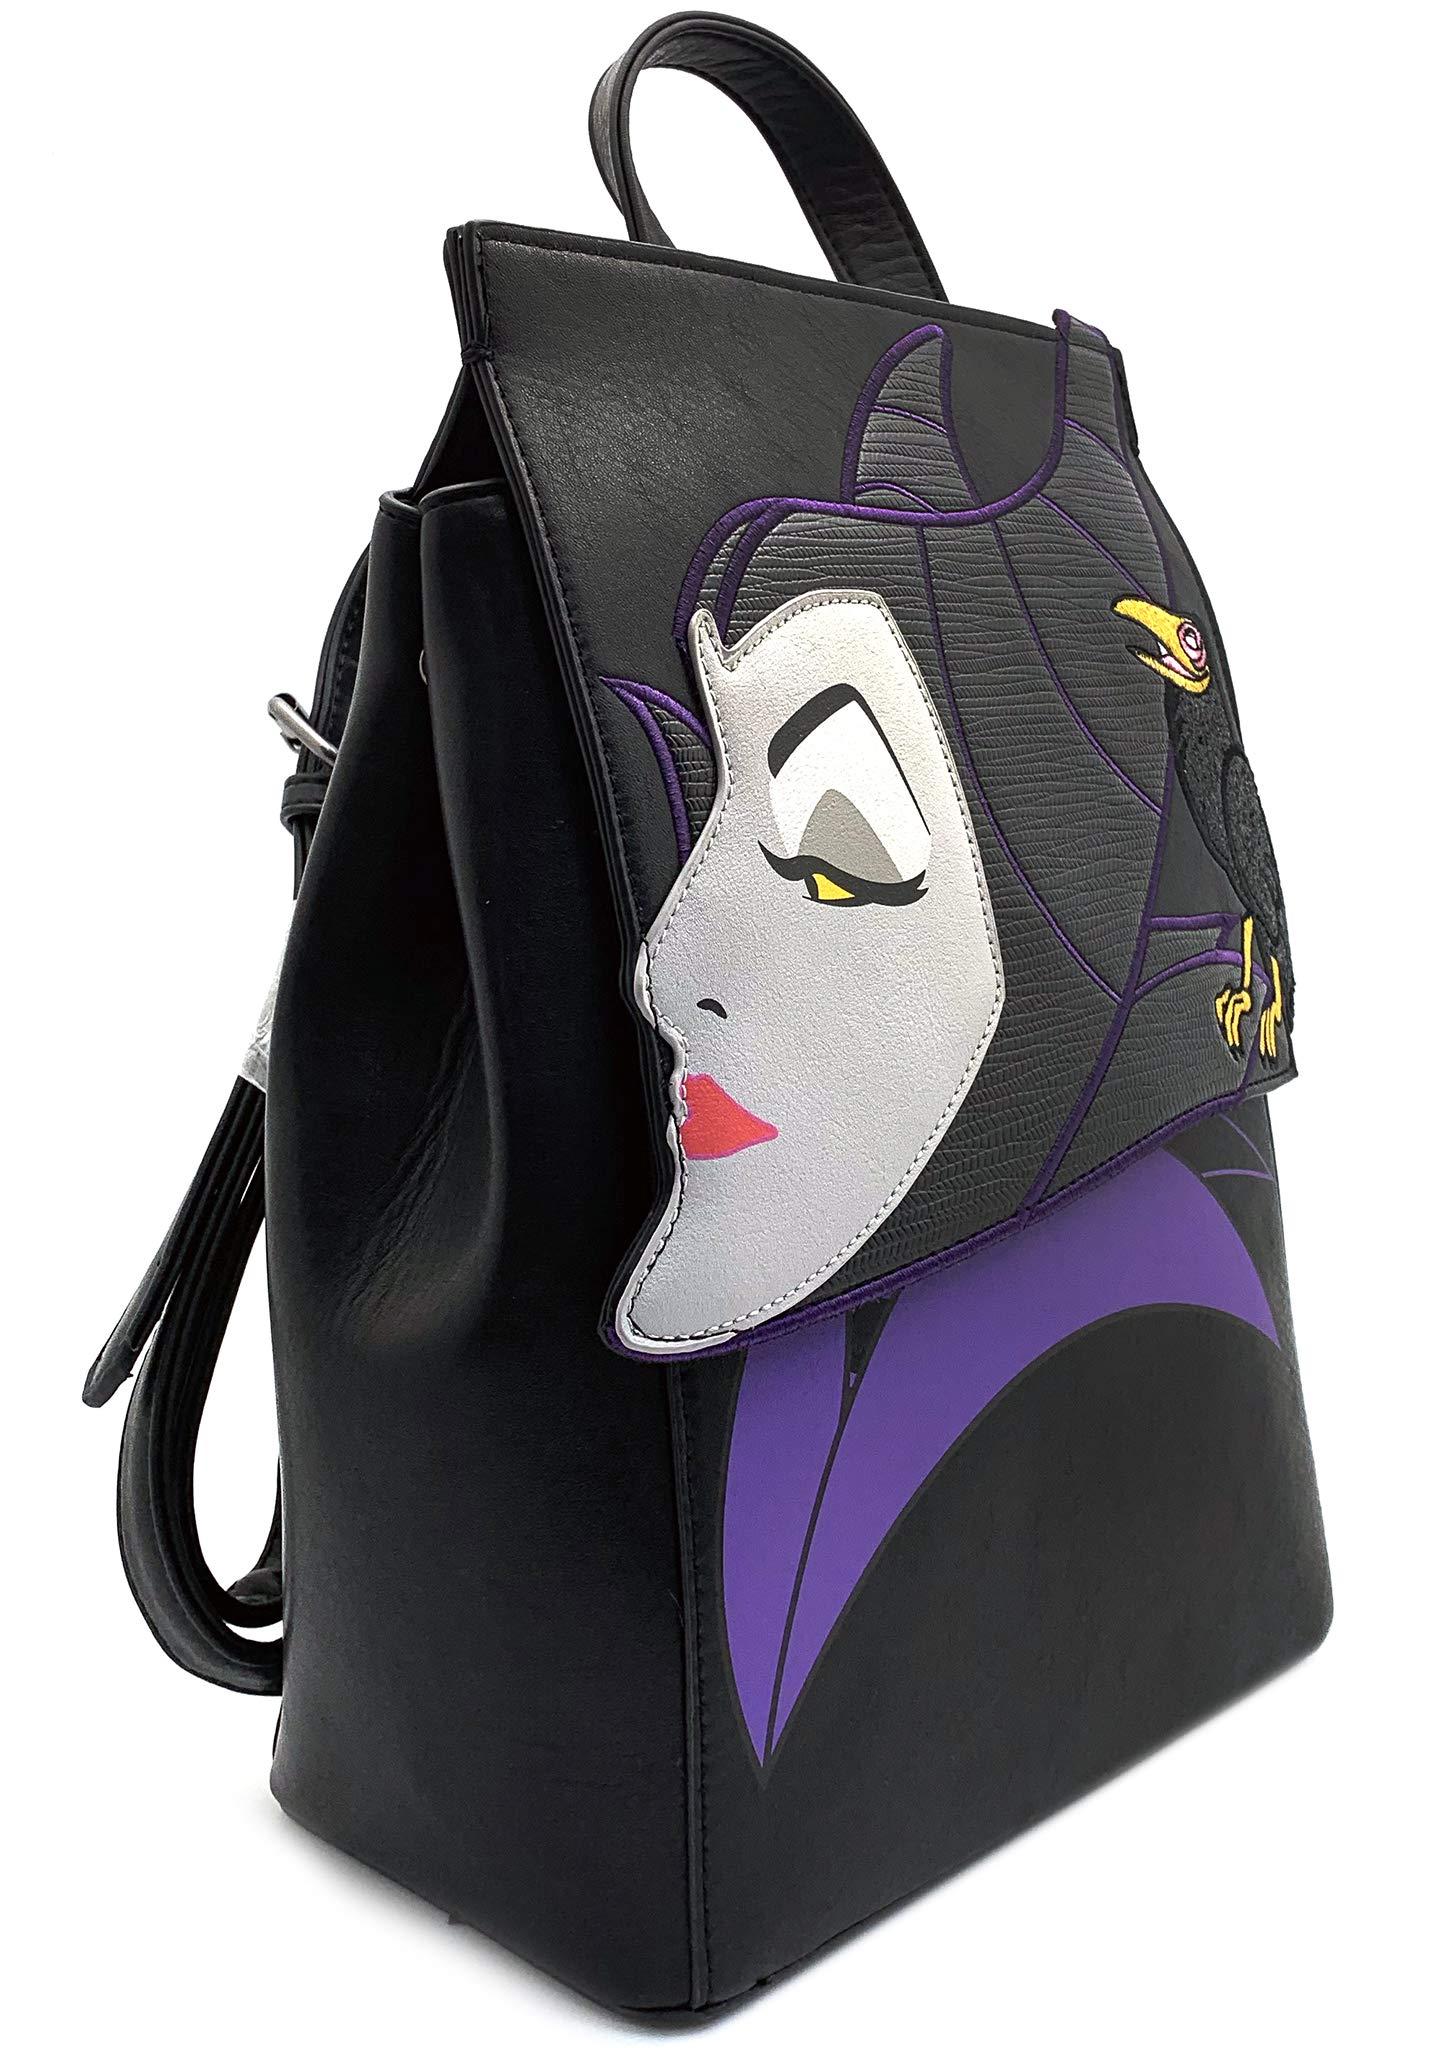 Disney By Danielle Nicole Sleeping Beauty Maleficent Raven Backpack Bag